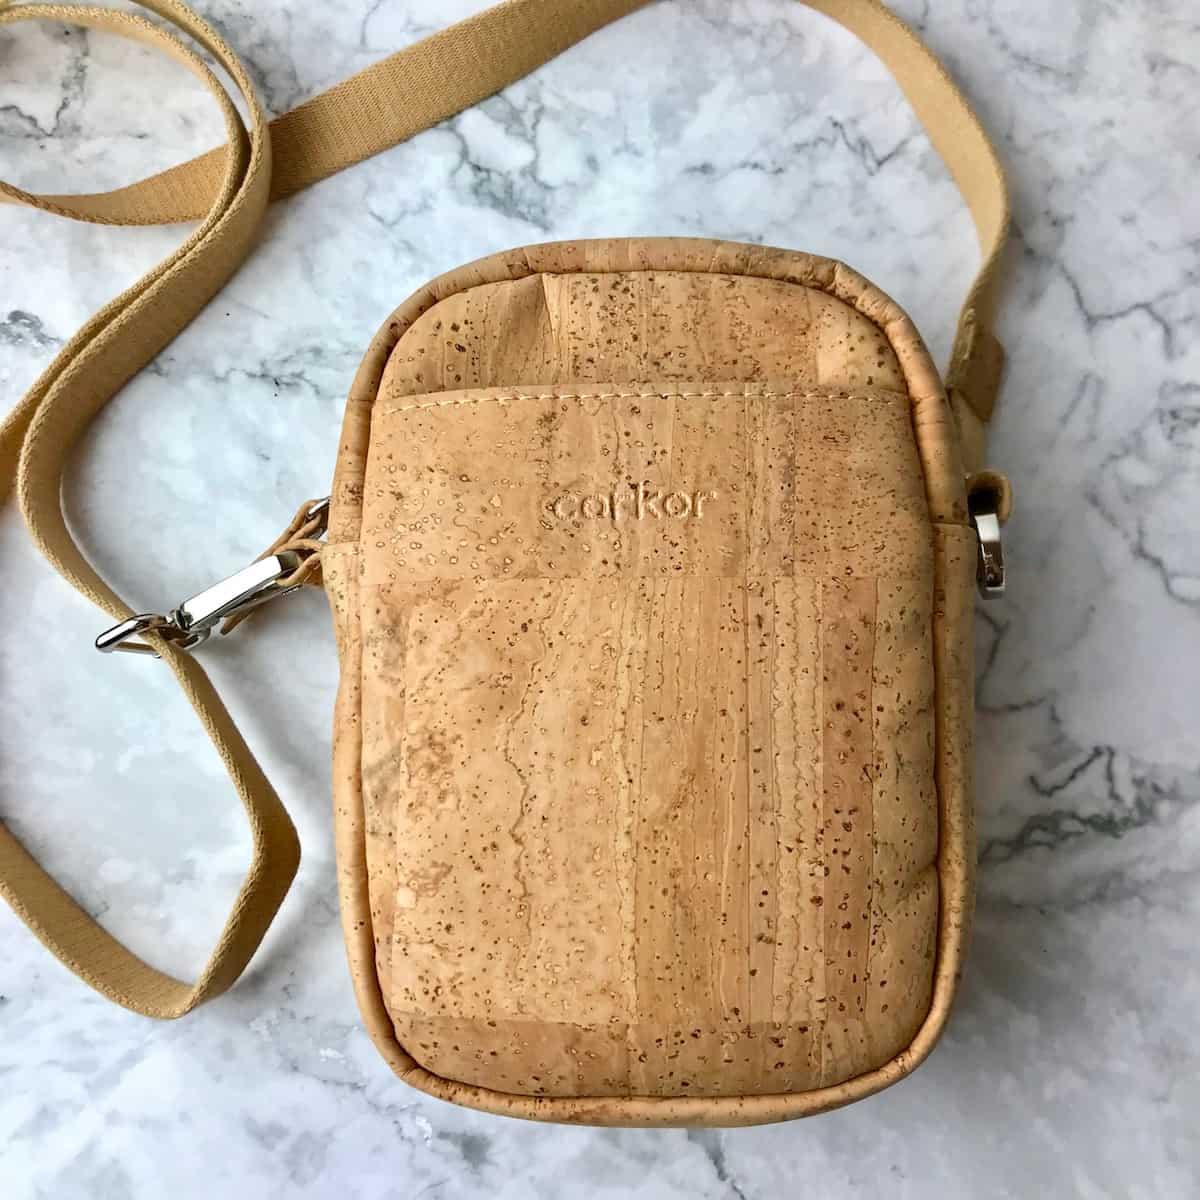 A crossbody bag made of cork.